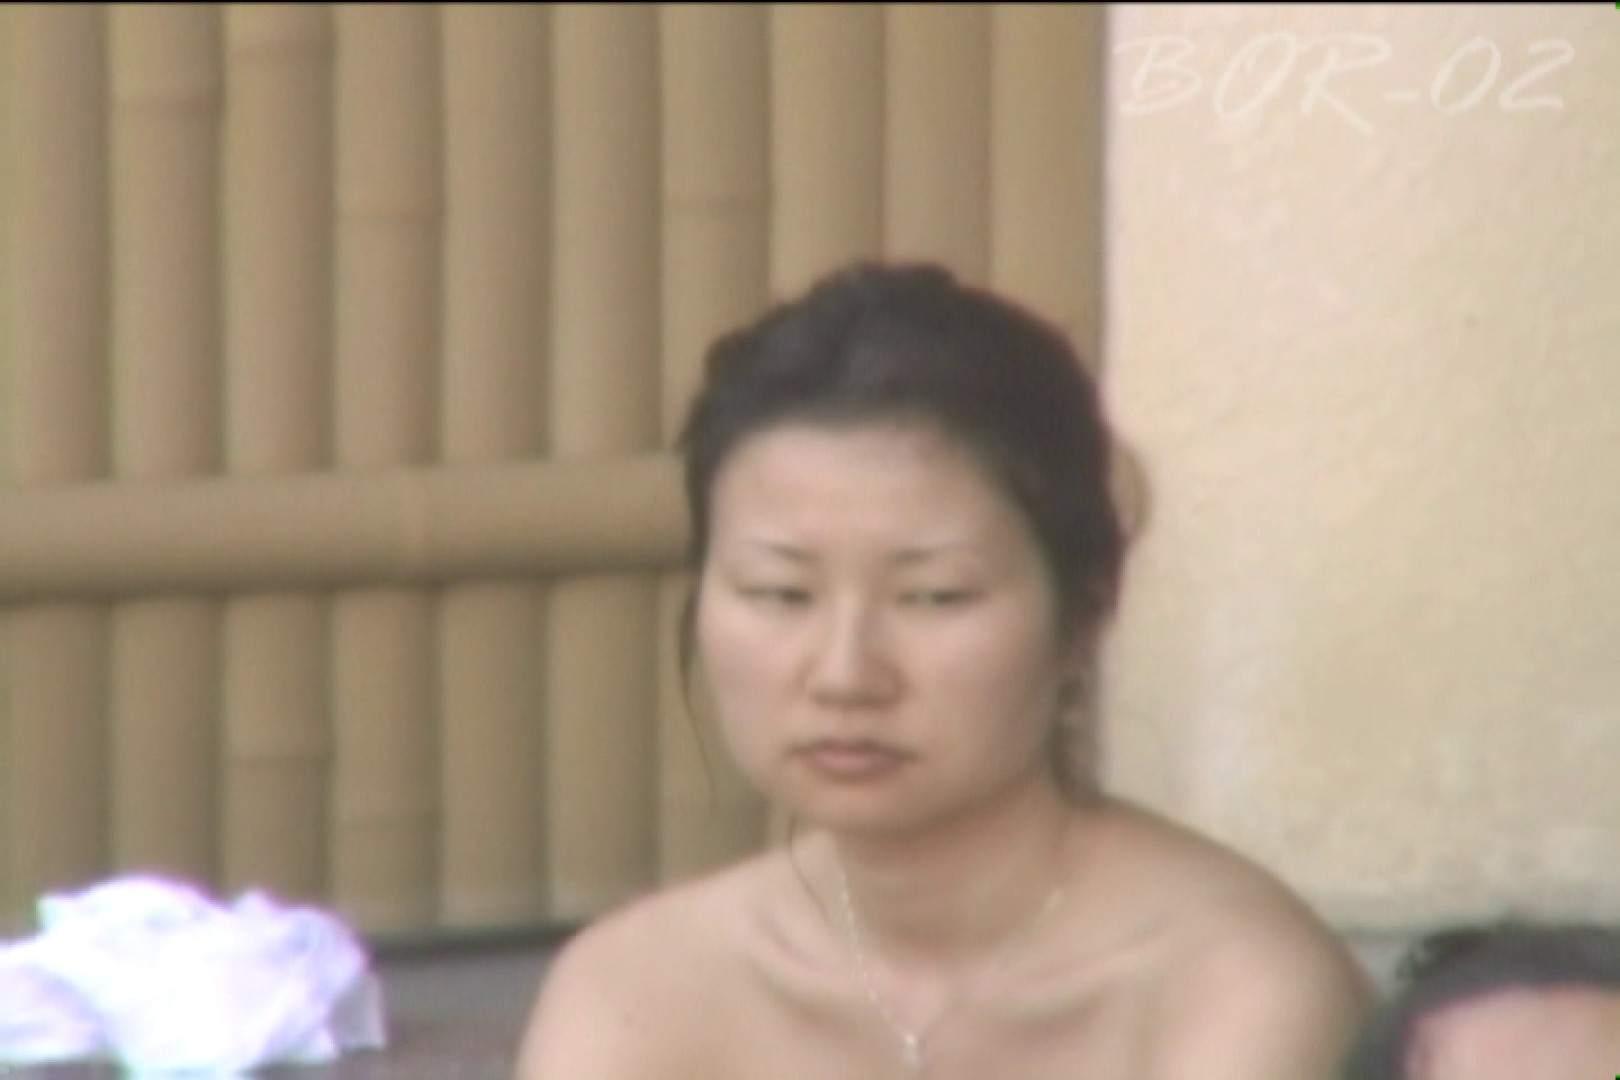 Aquaな露天風呂Vol.477 露天 アダルト動画キャプチャ 99PICs 92